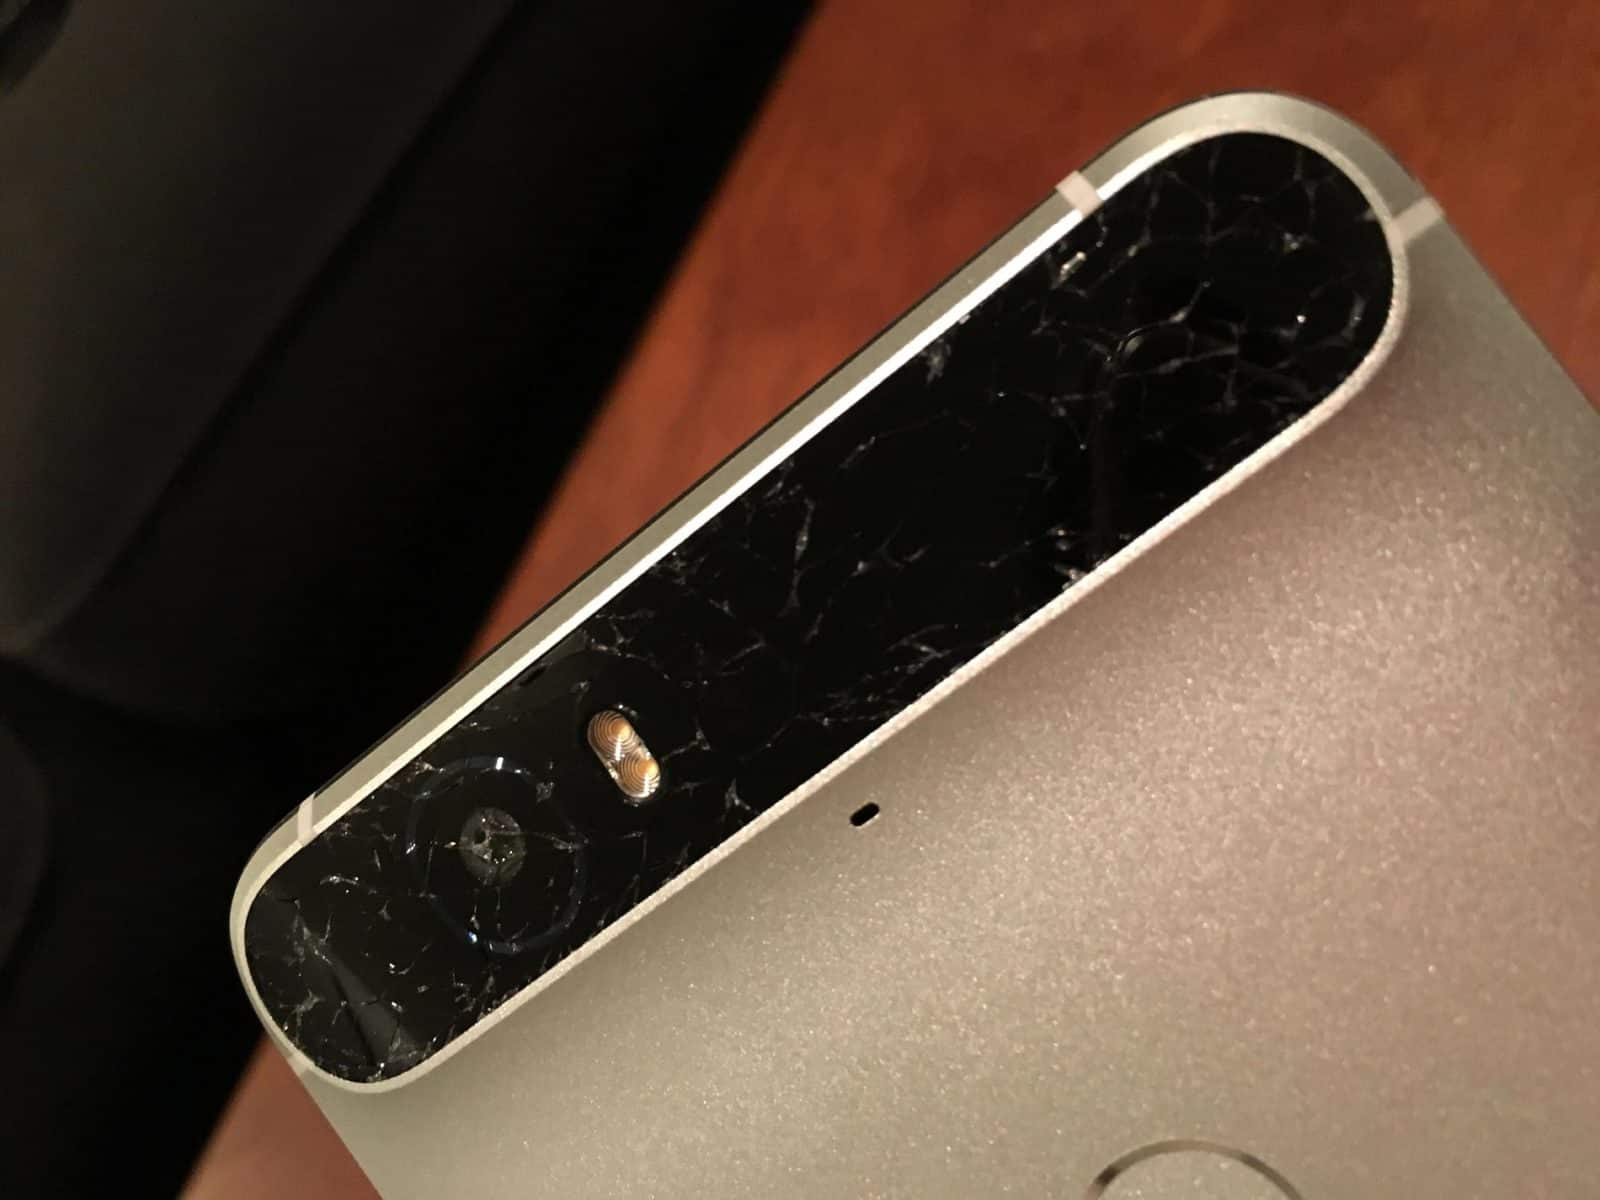 Nexus 6p cracked glass 1